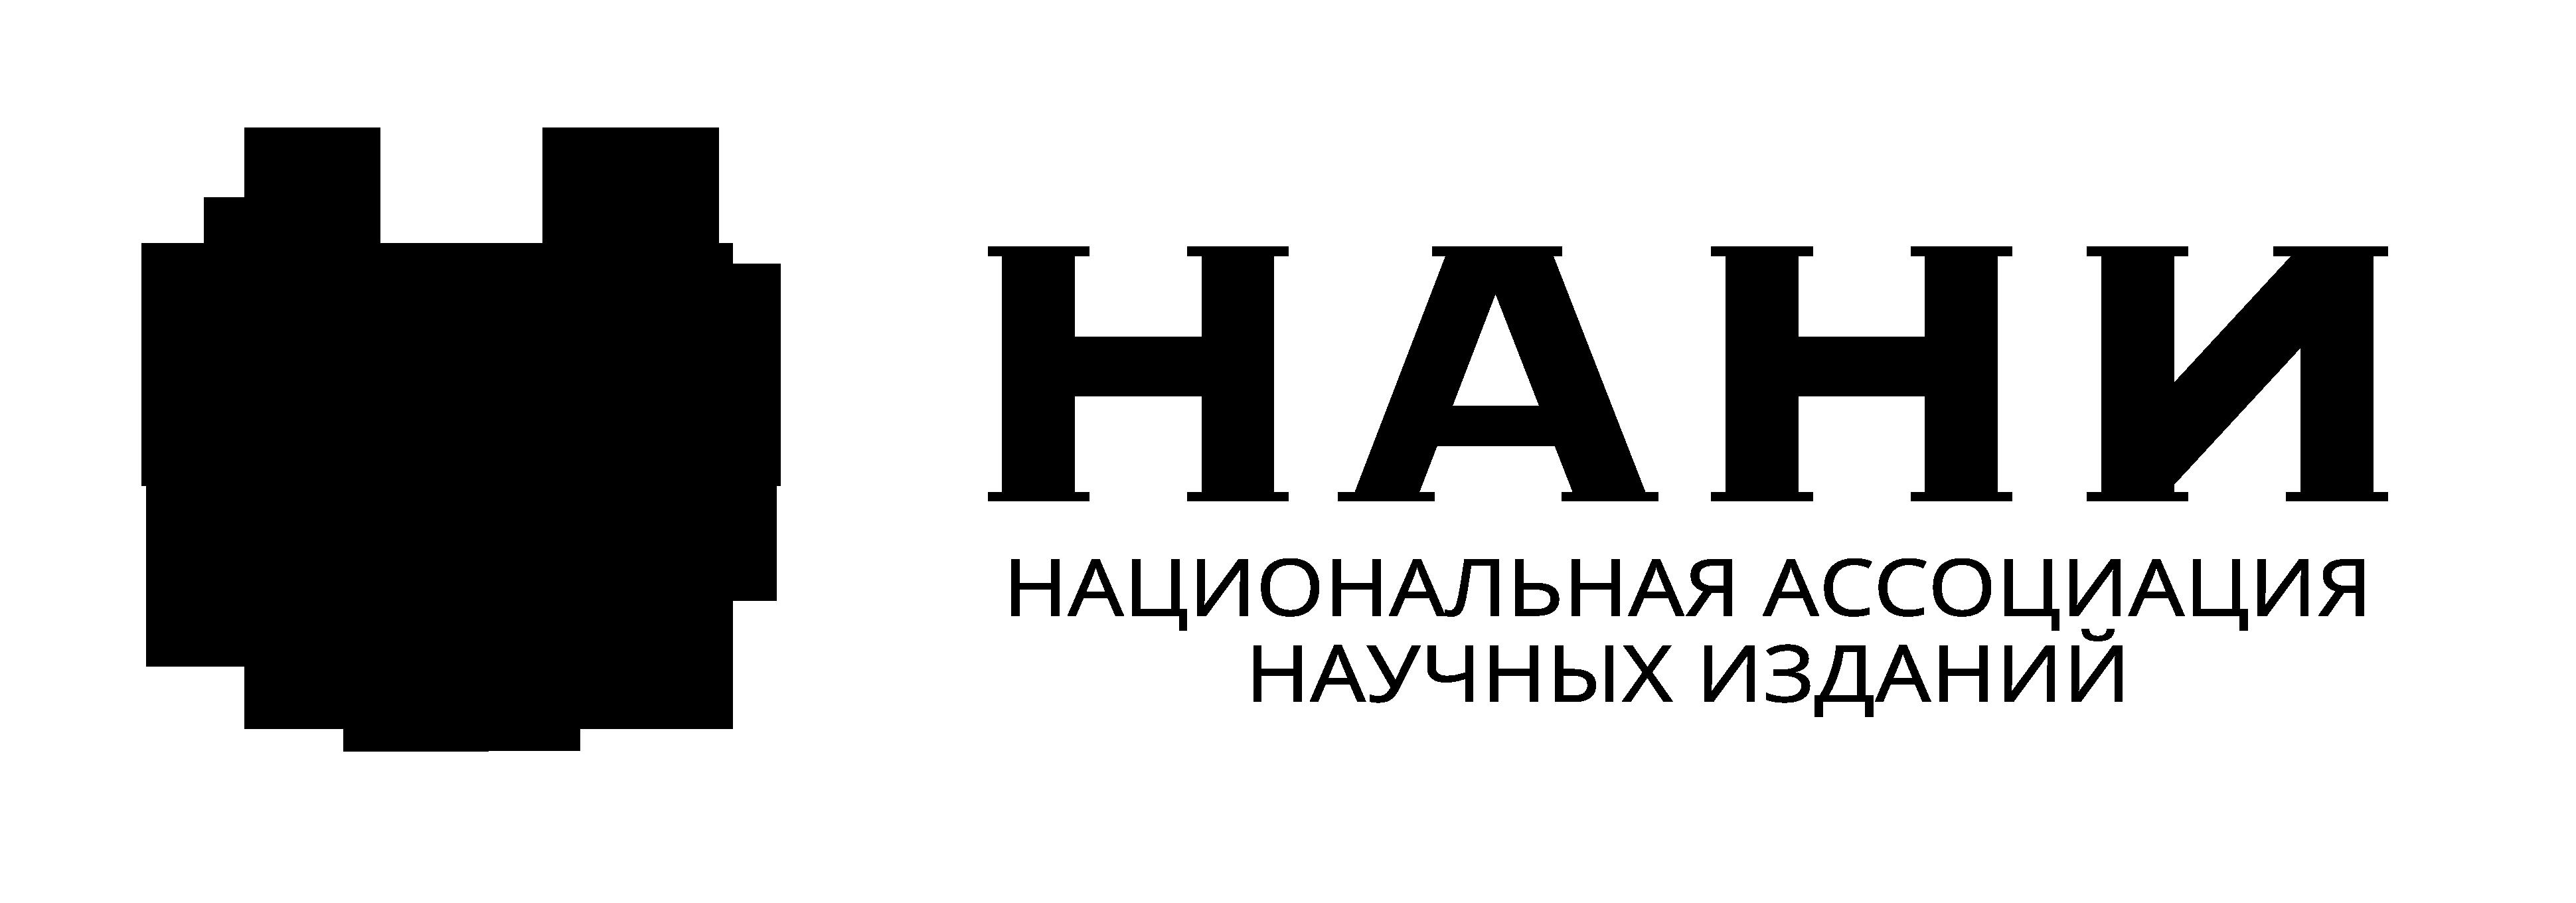 Logo for НАНИ - Национальная ассоциация научных изданий